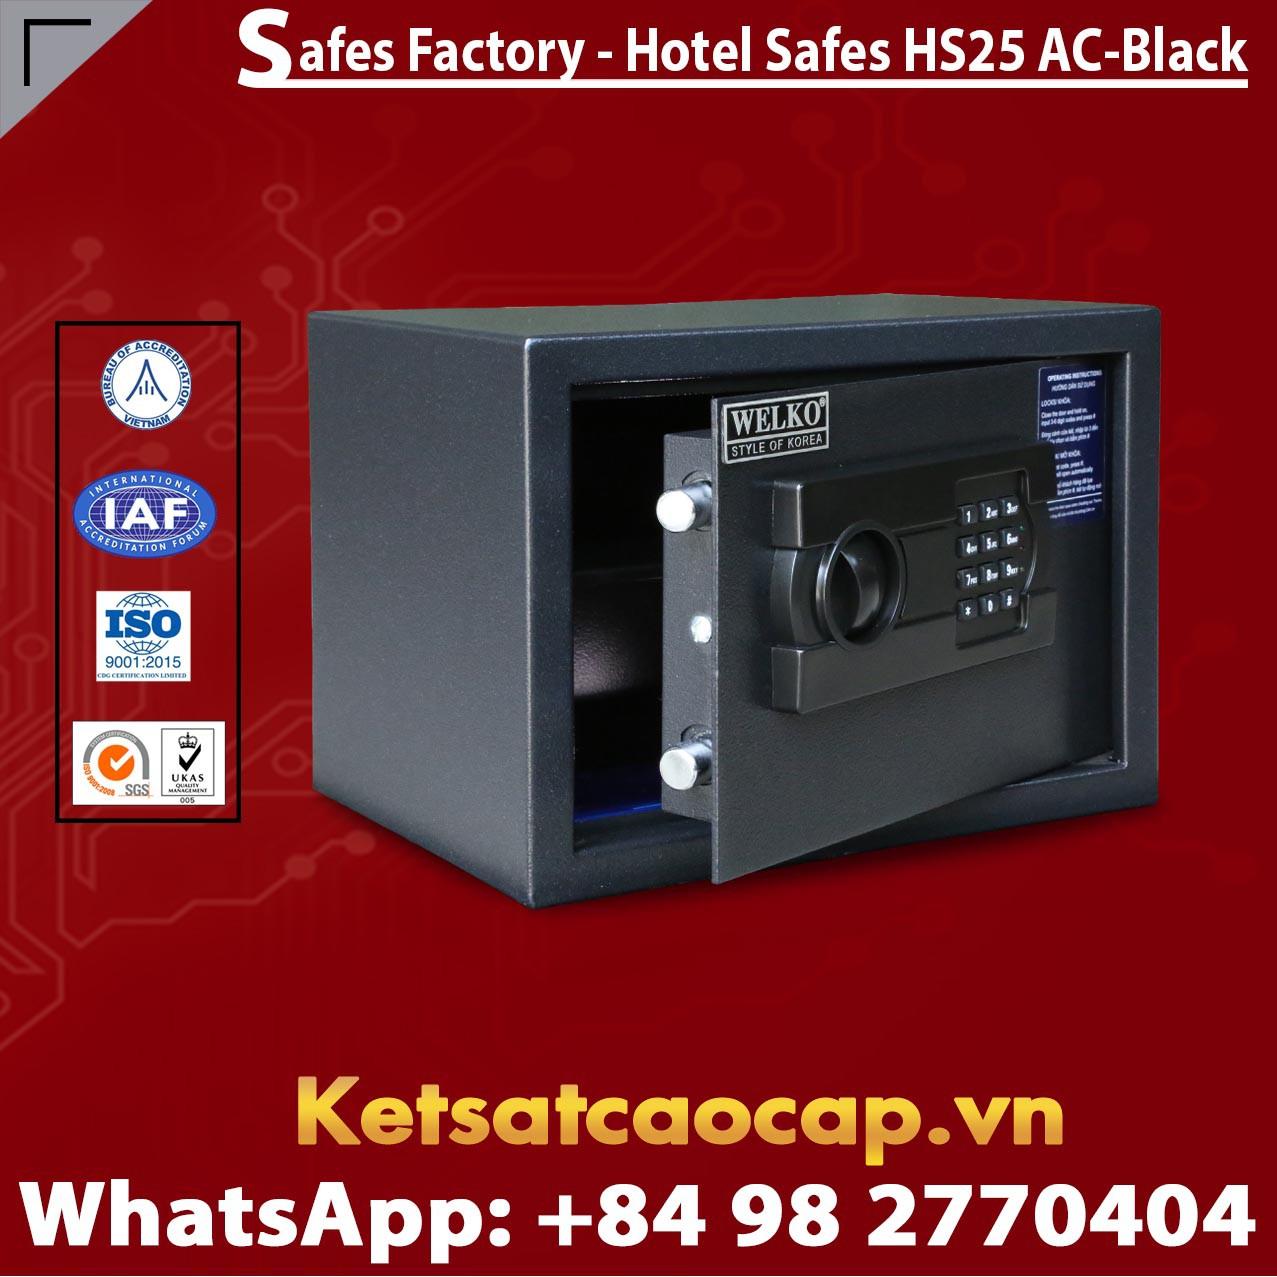 Hotel Safes  WELKO HS25 AC